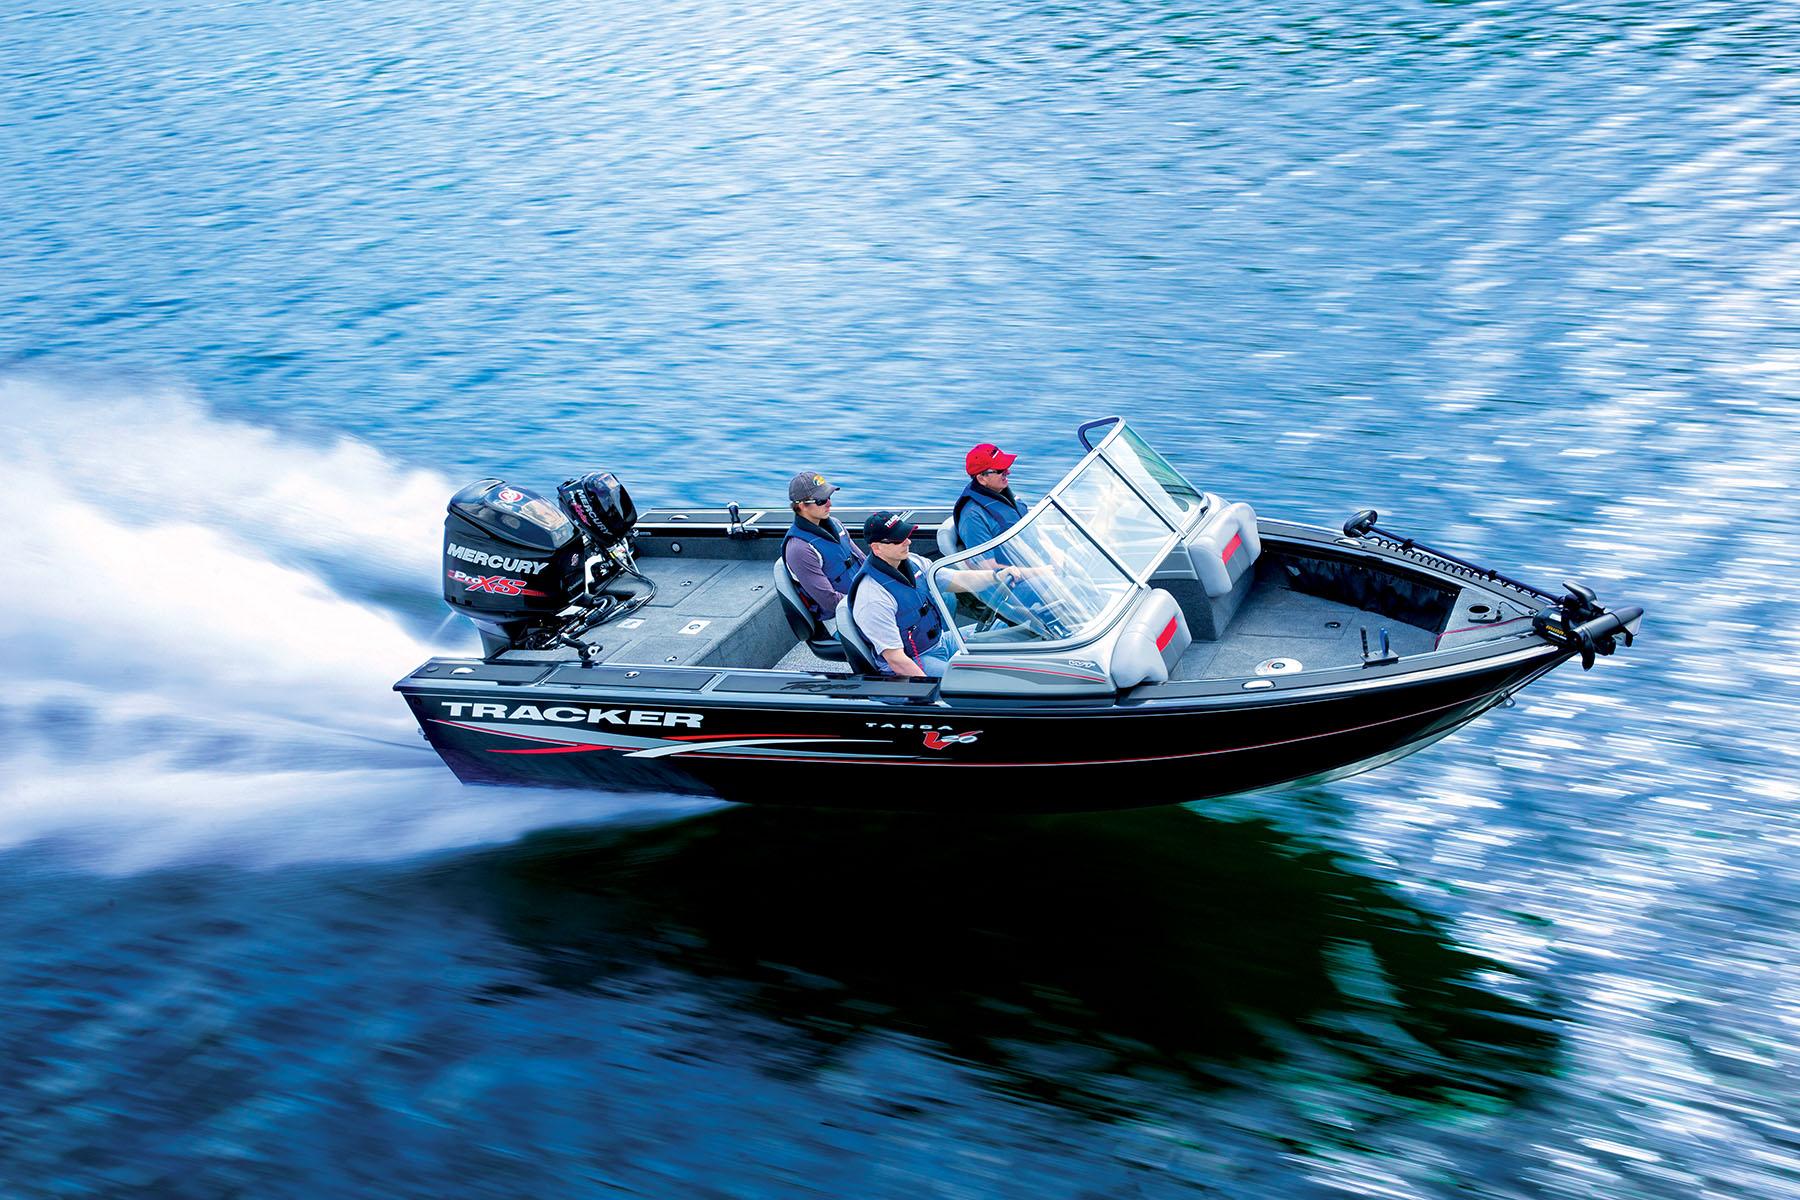 2016 tracker targa v 20 wt fishing boat for Tracker fishing boats